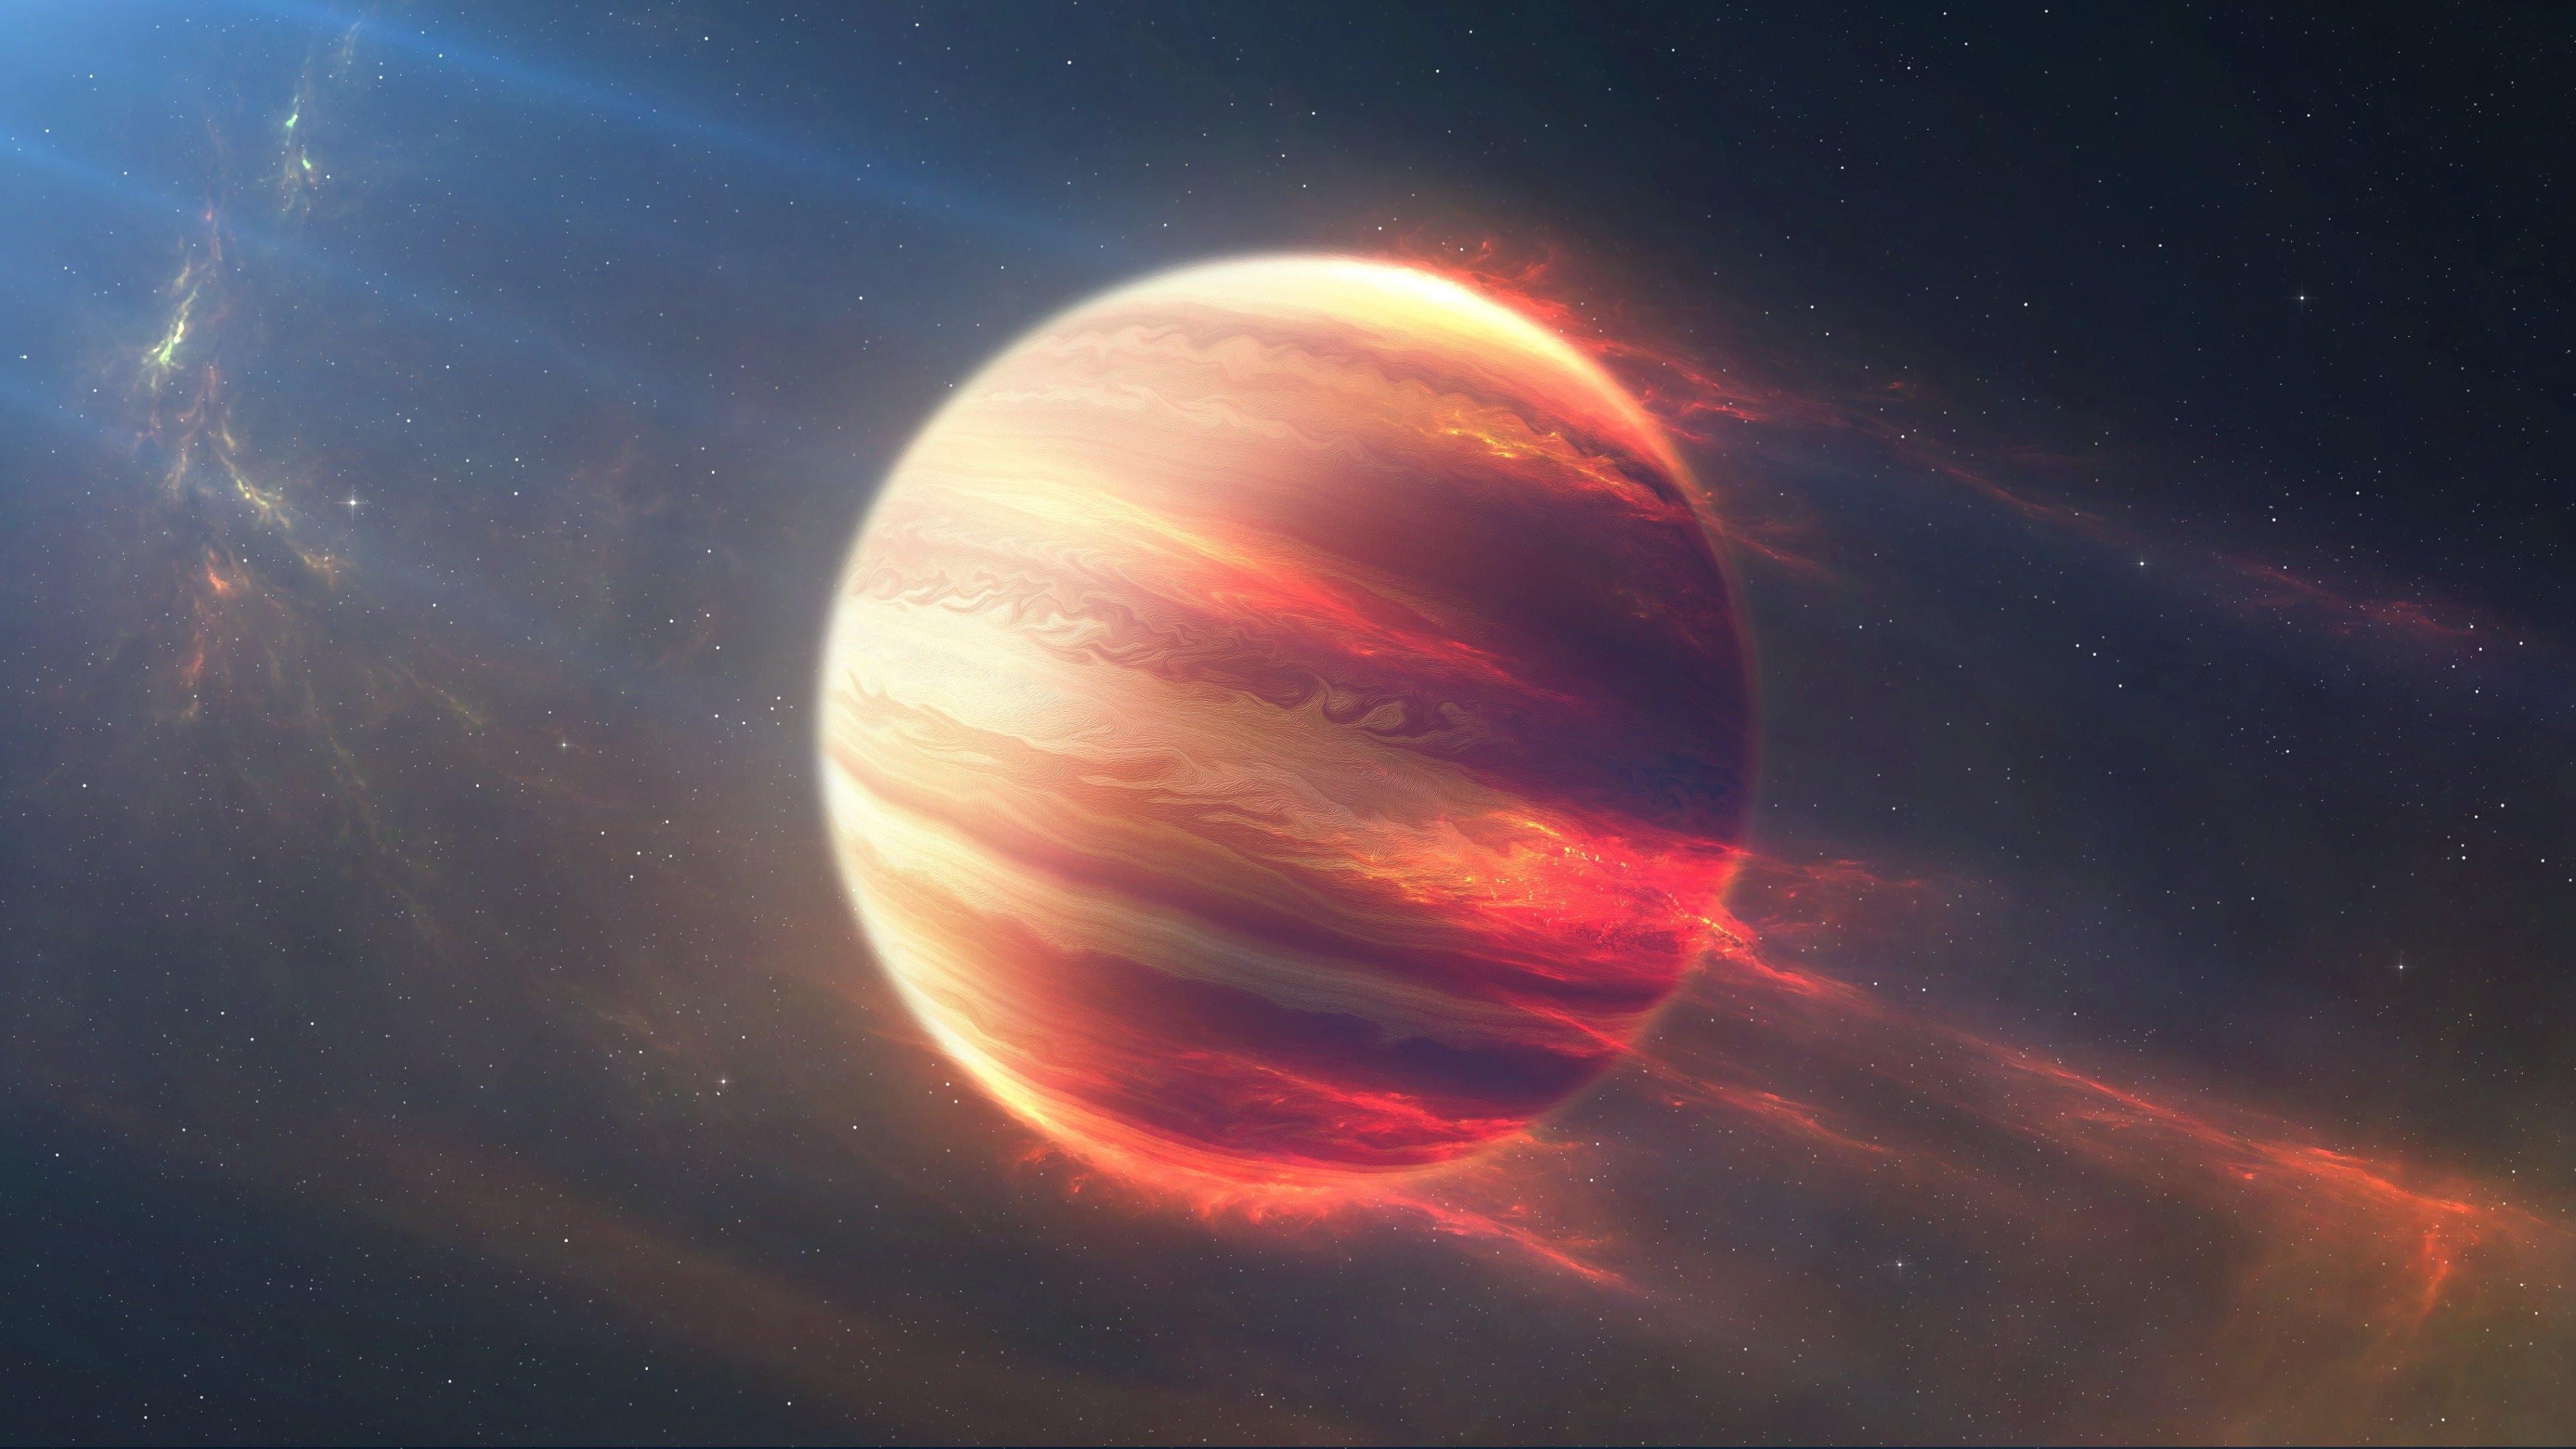 Sfondi Galassia 68 Immagini